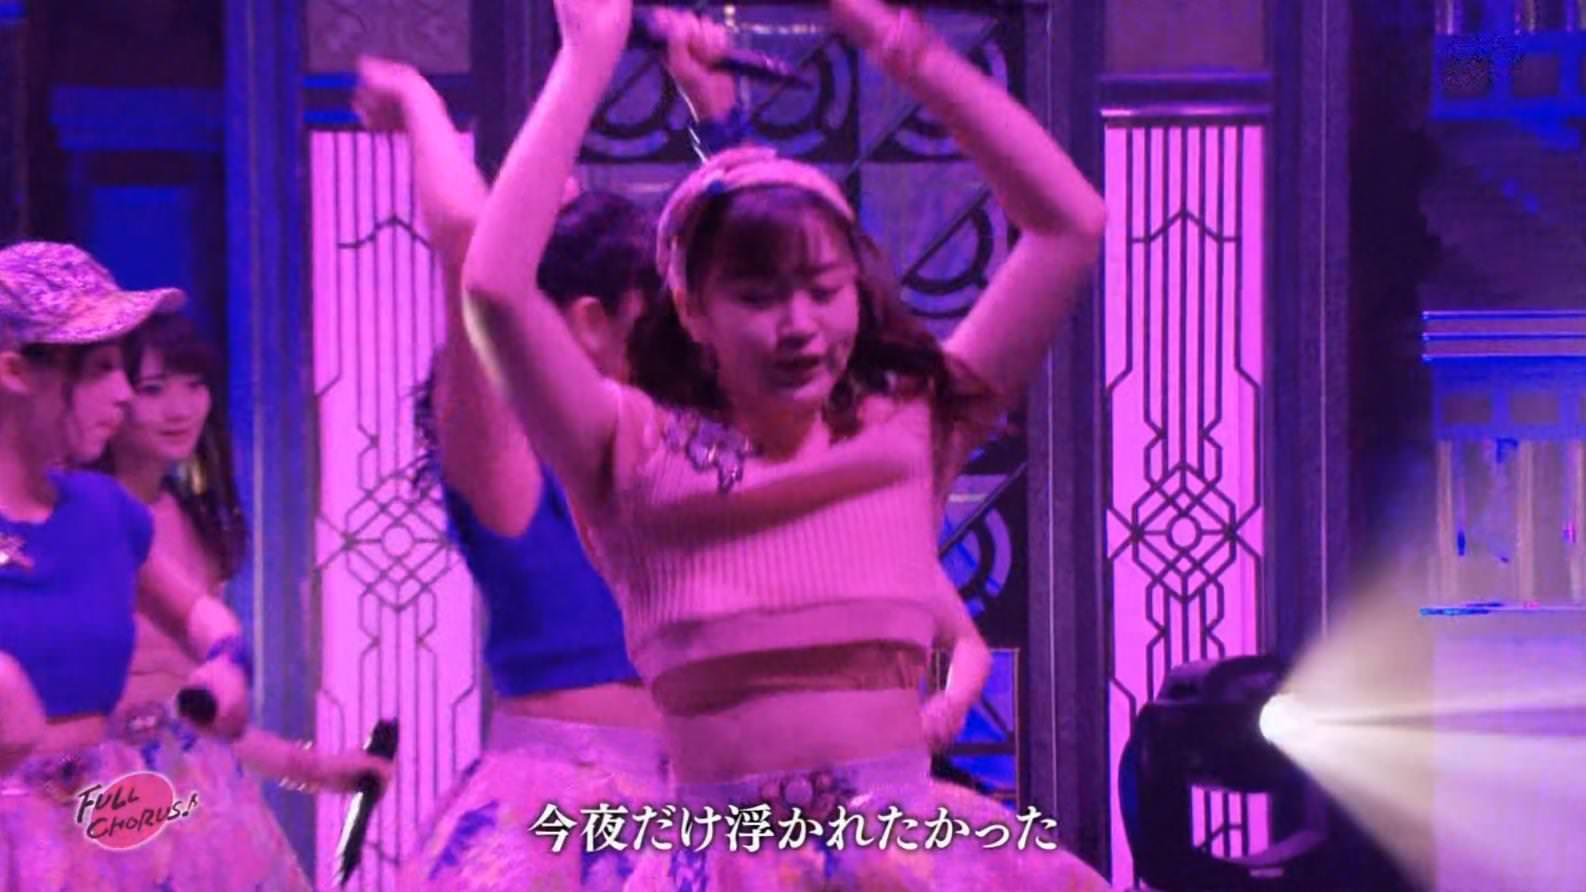 http://www.mybitchisajunky.com/whg/picture/WXto7B2_5c055ff69f801.jpg